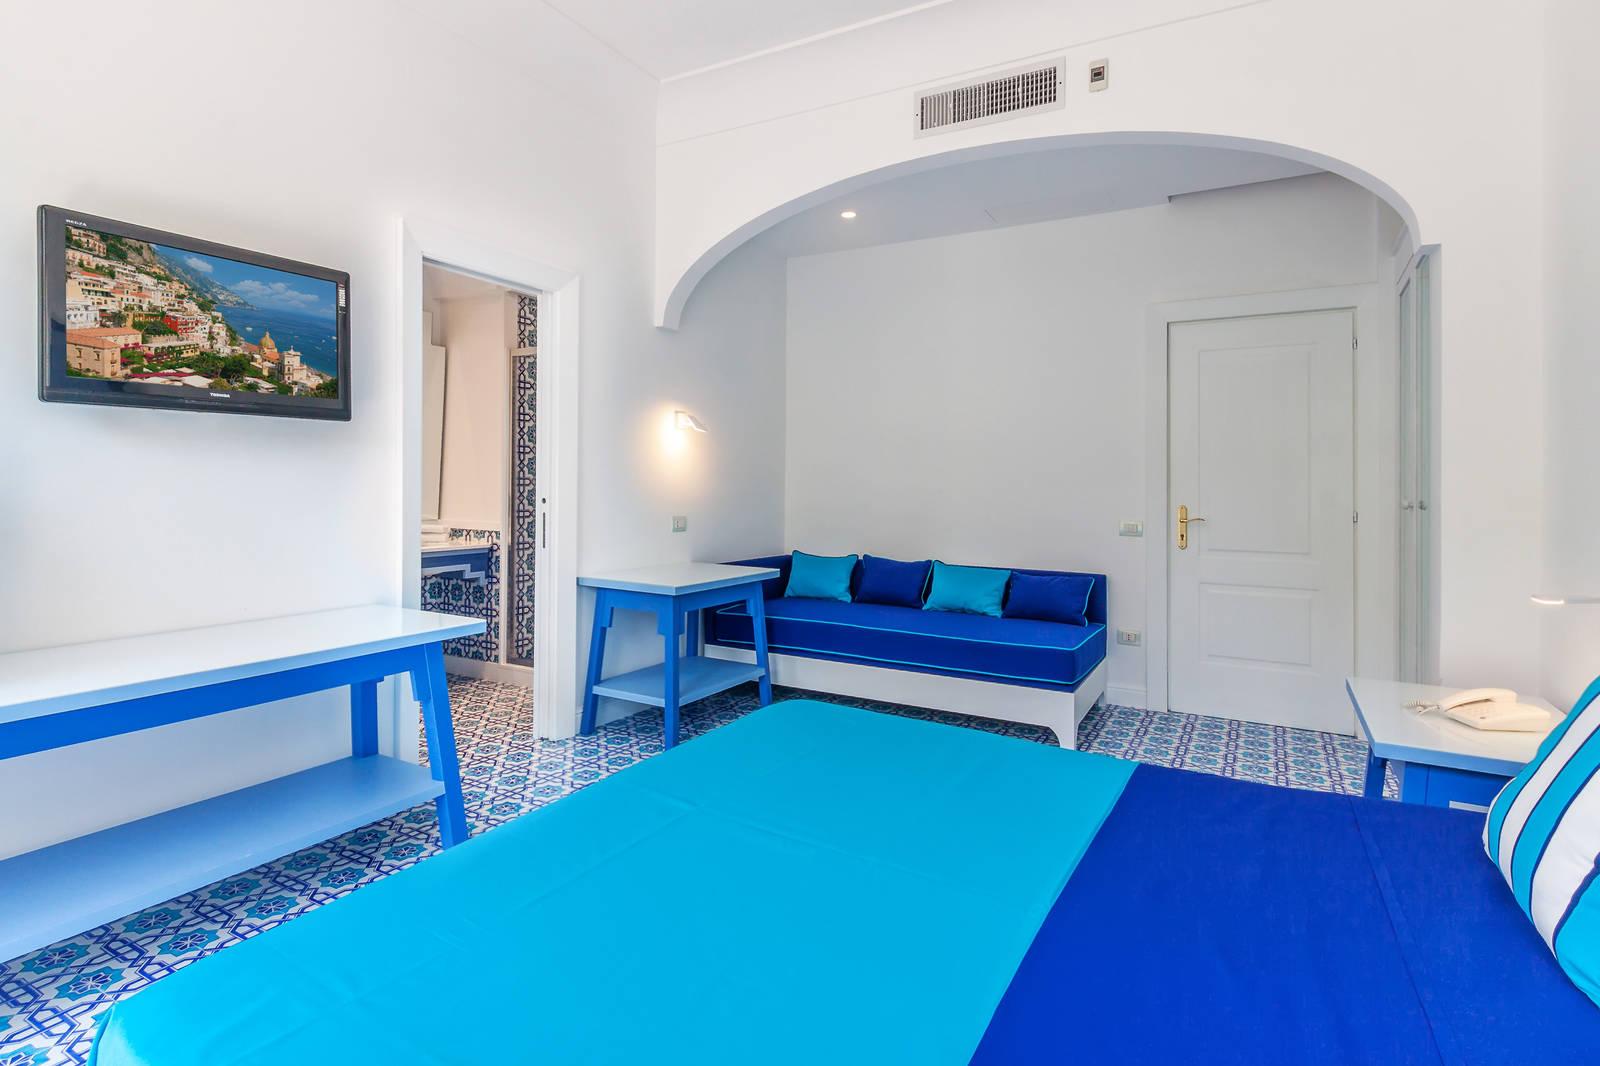 Deluxe Sorrento Hotel Mignon Hotel Sorrento Italy Coast Amalfi Capri # Meuble Tv Okay